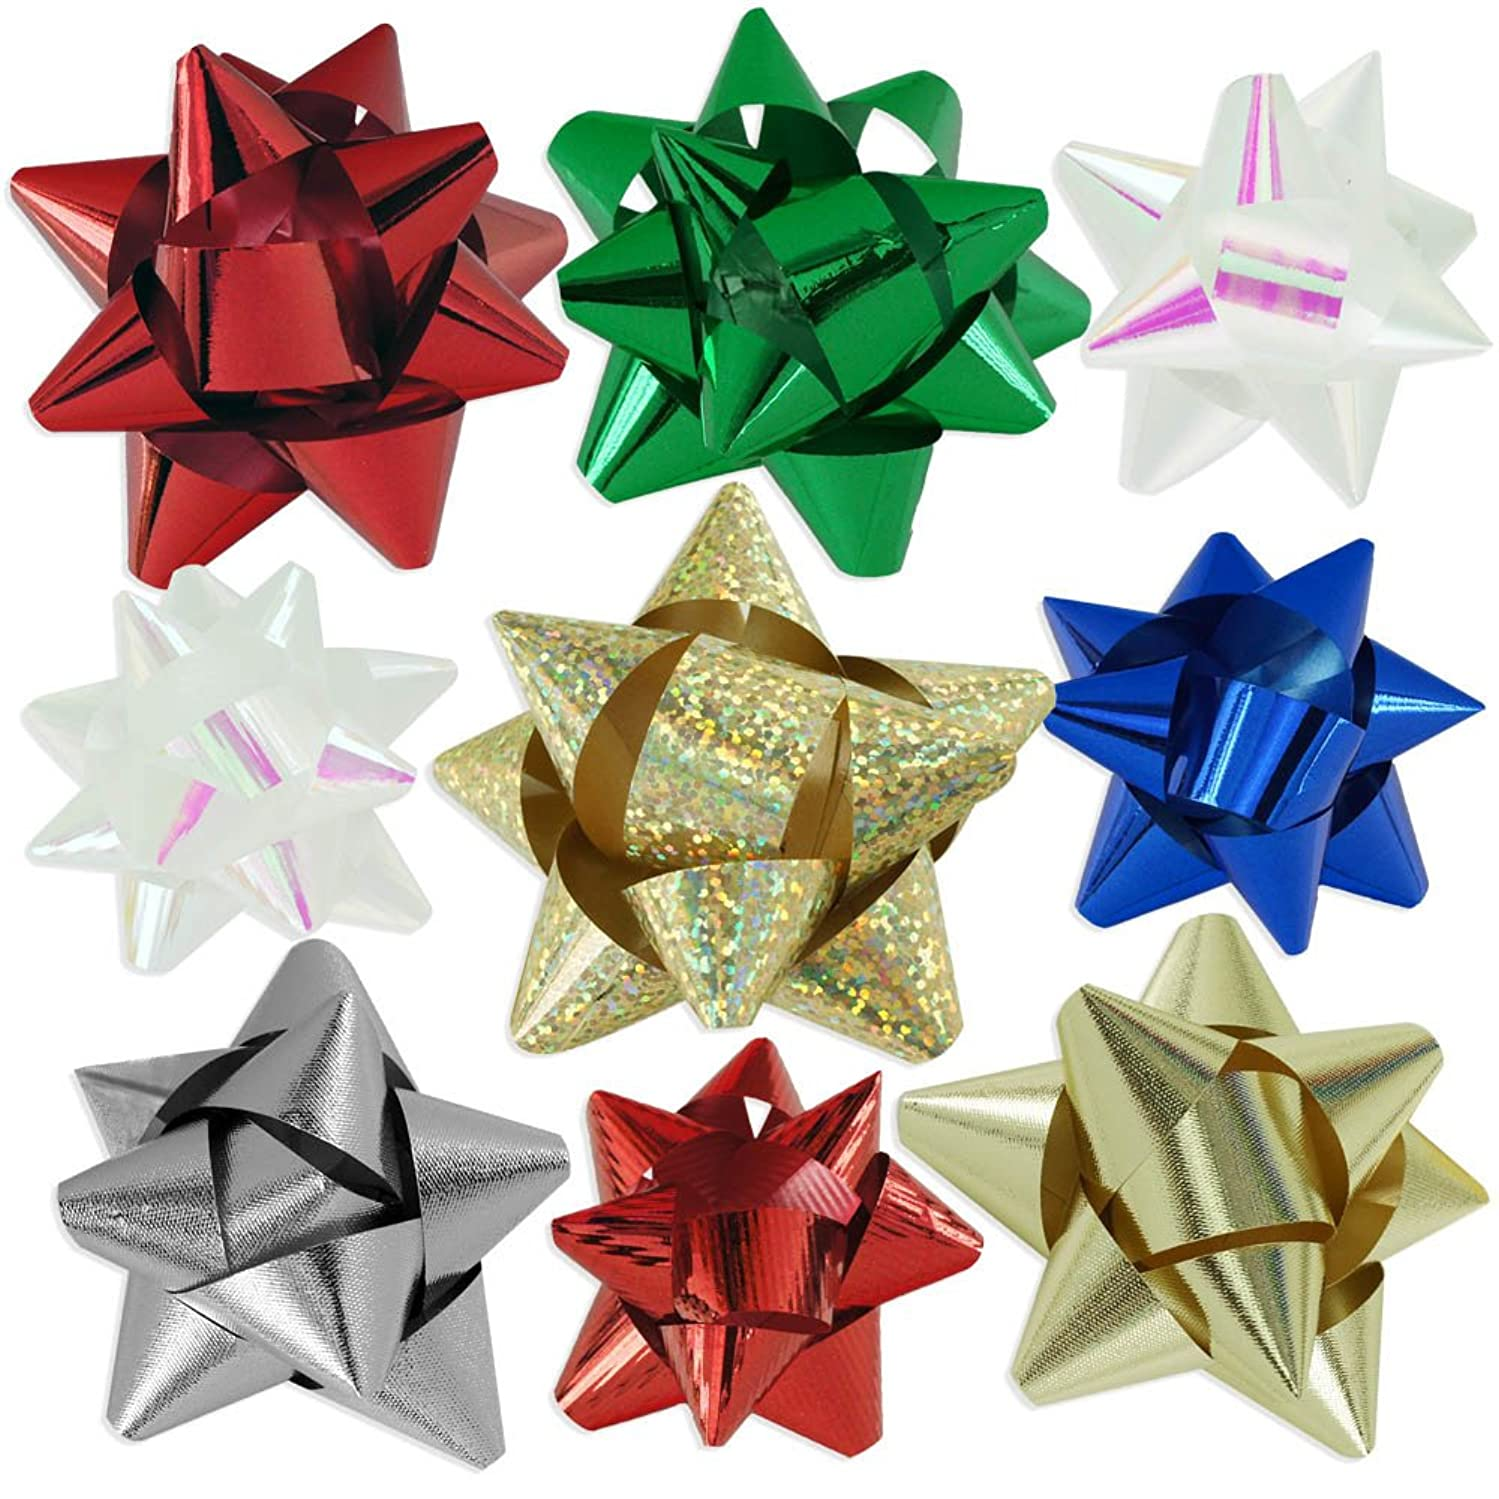 72pc Designer Holiday Christmas Gift Bow Assortment - Elegant Metallic, Iridescent, Holographic, Glitter, Lacquer Finishes